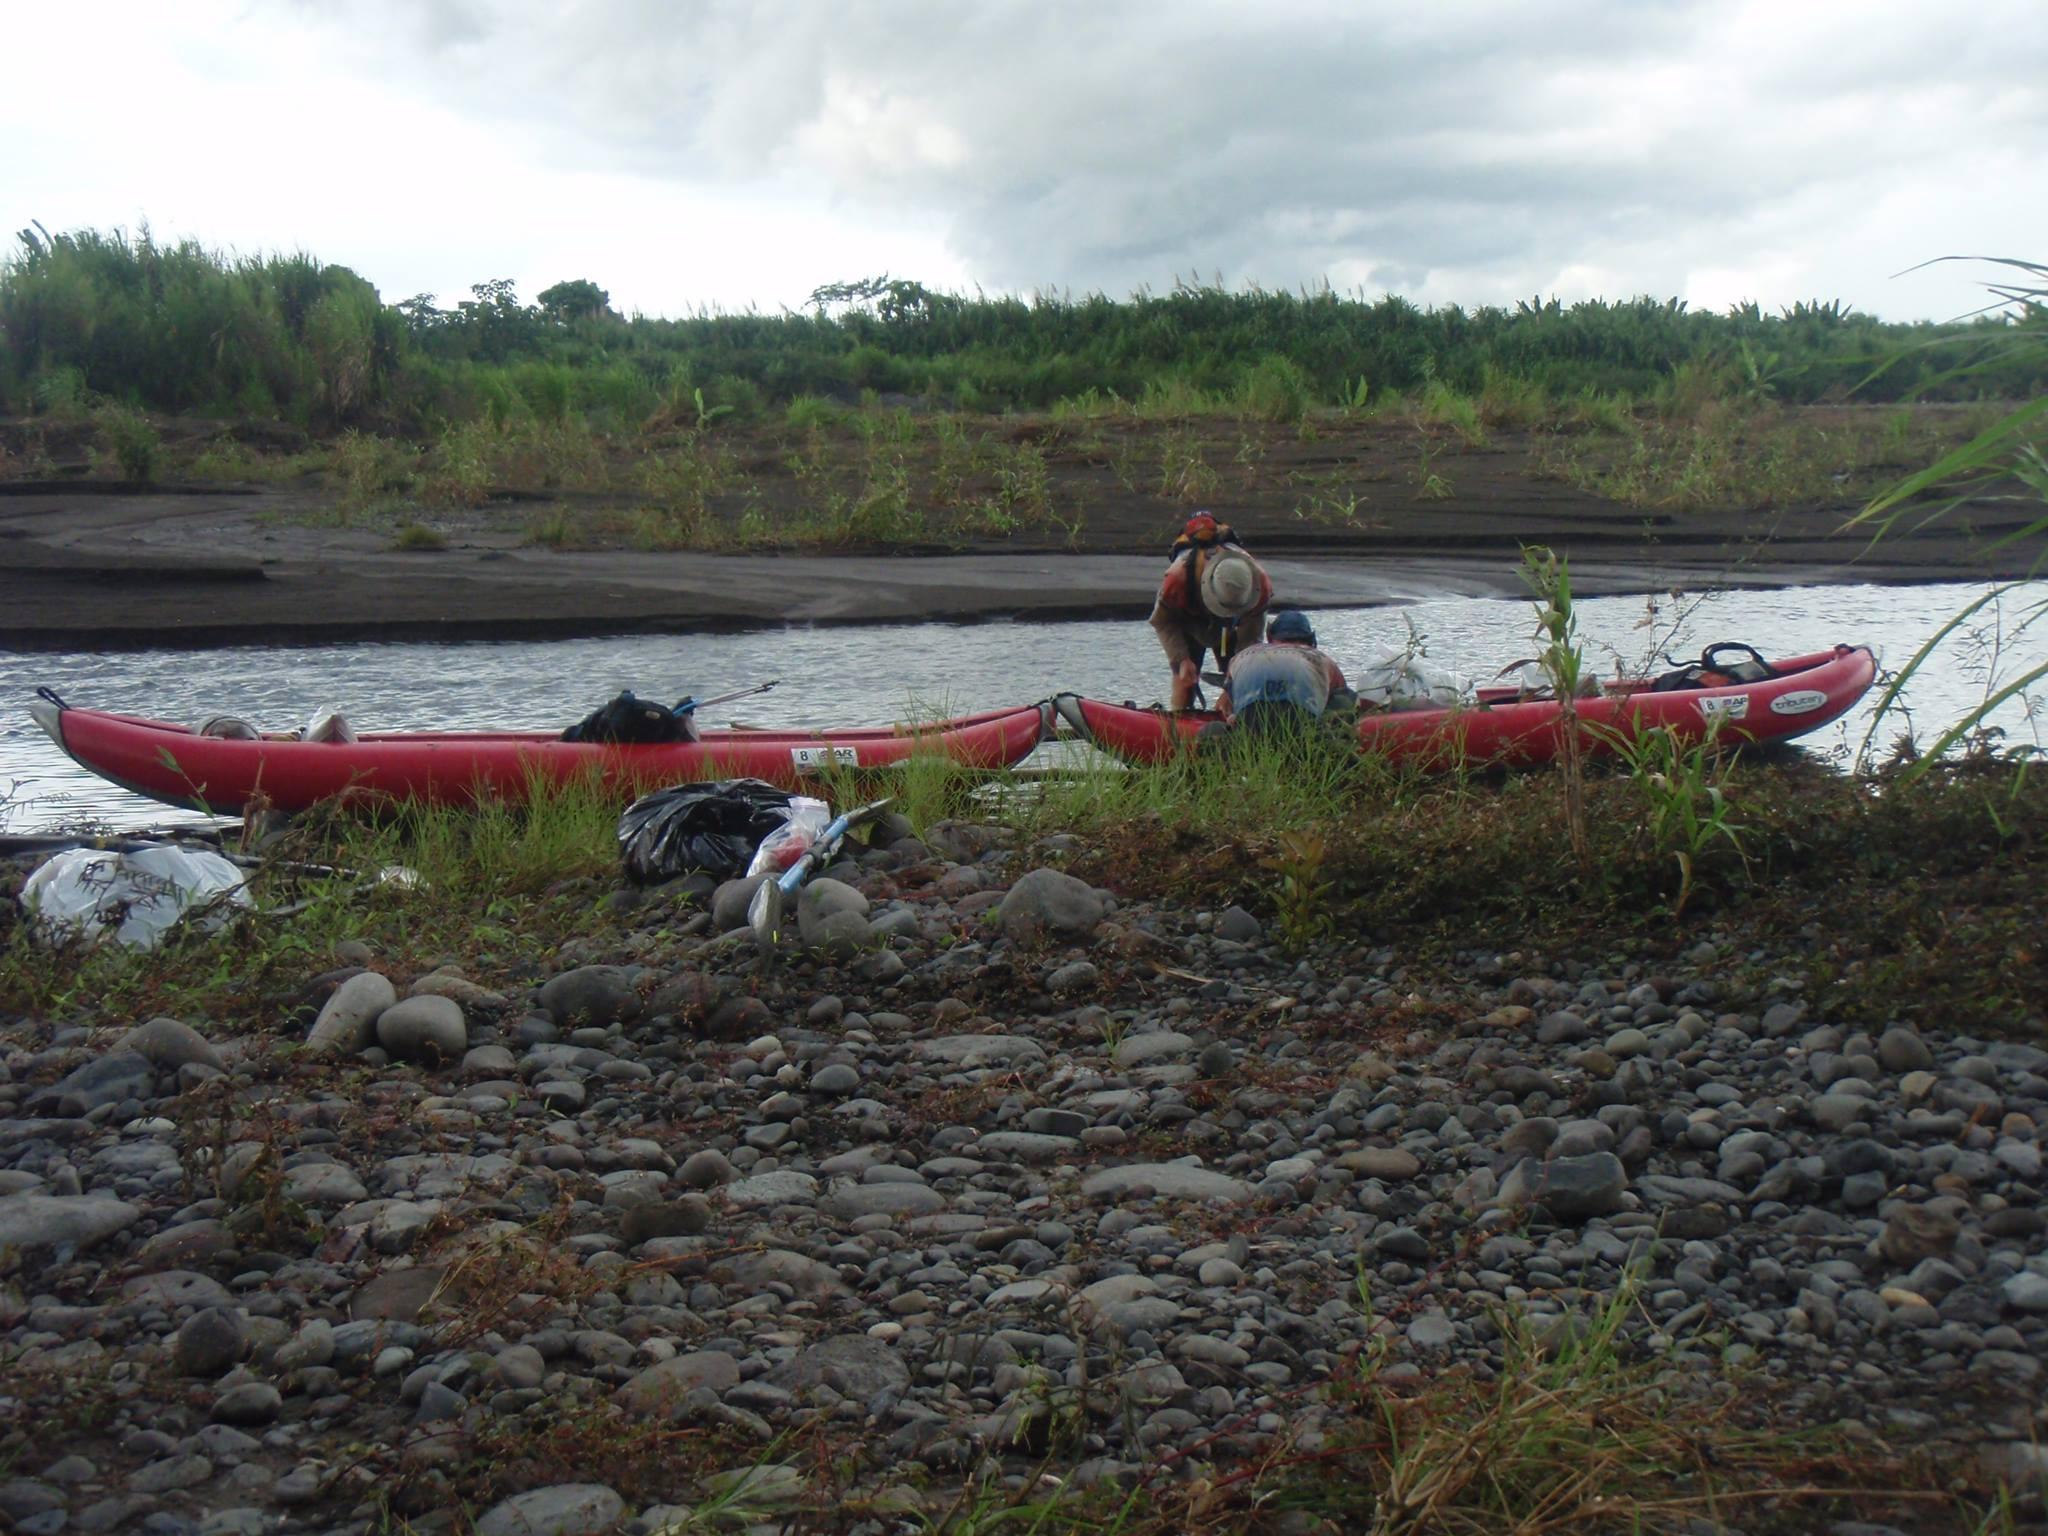 Costa Rica Boat Rigging.jpg